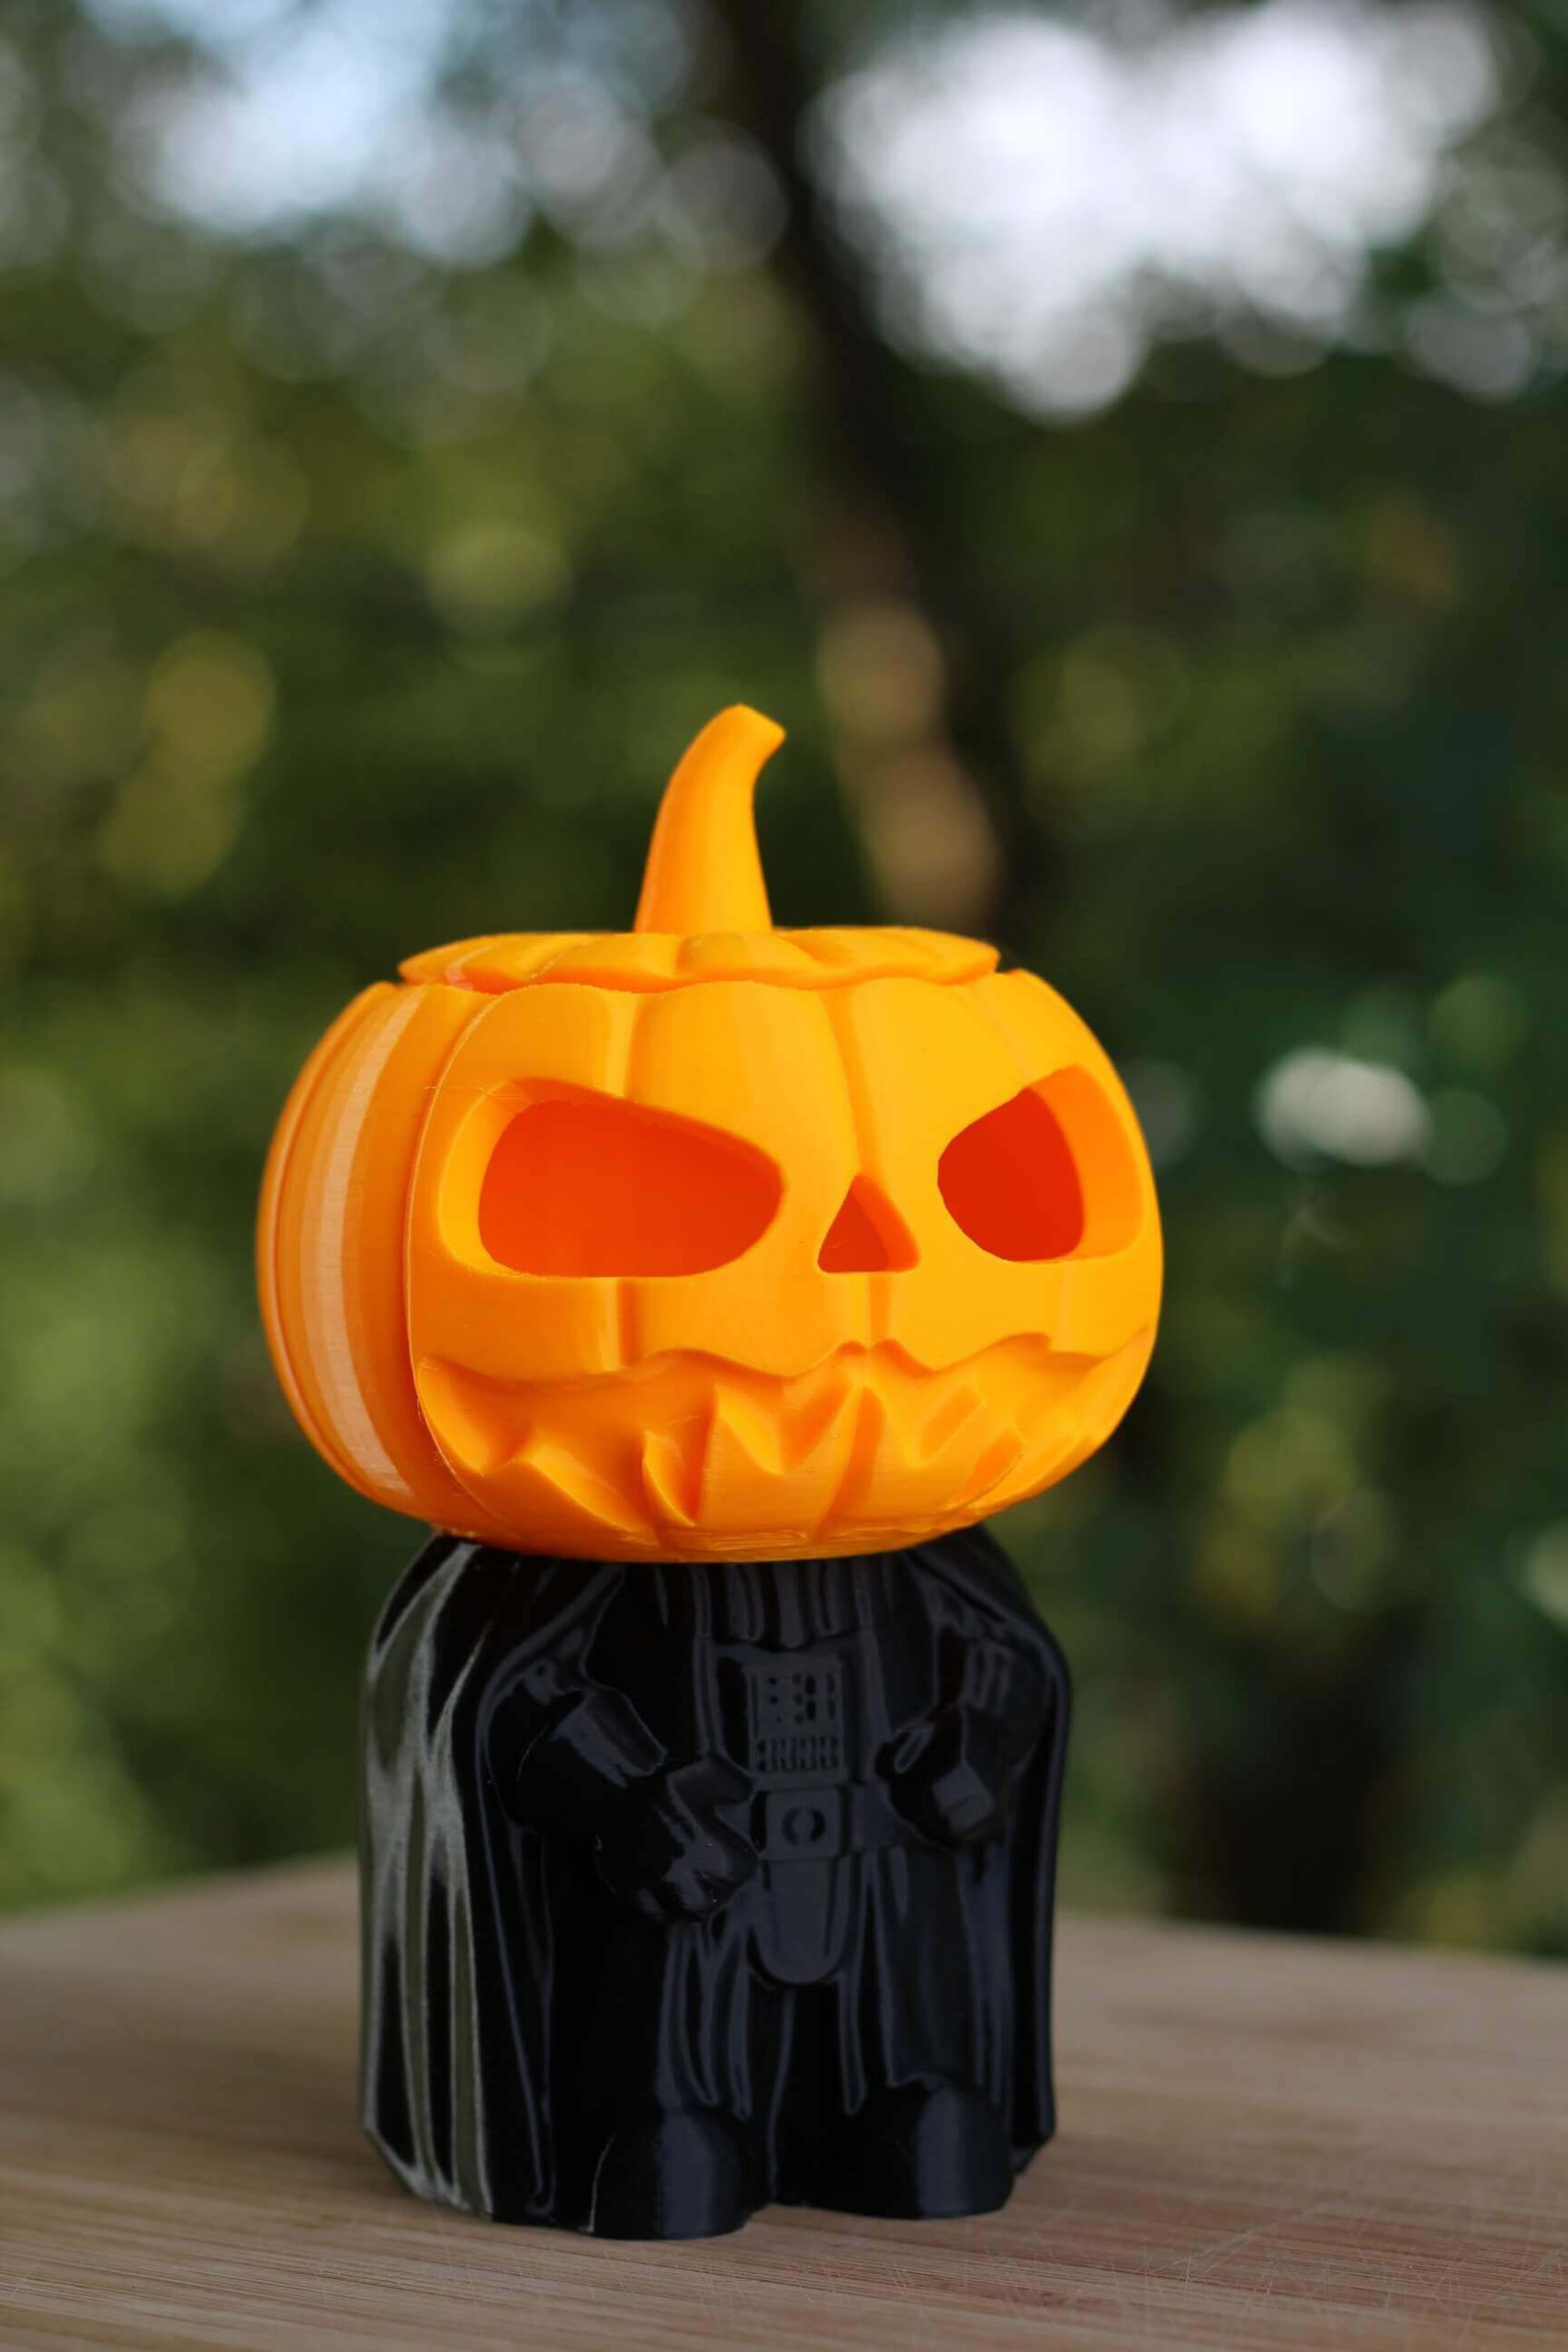 Darth-Pumpkin-printedo-n-the-Creality-CR-6-SE-3